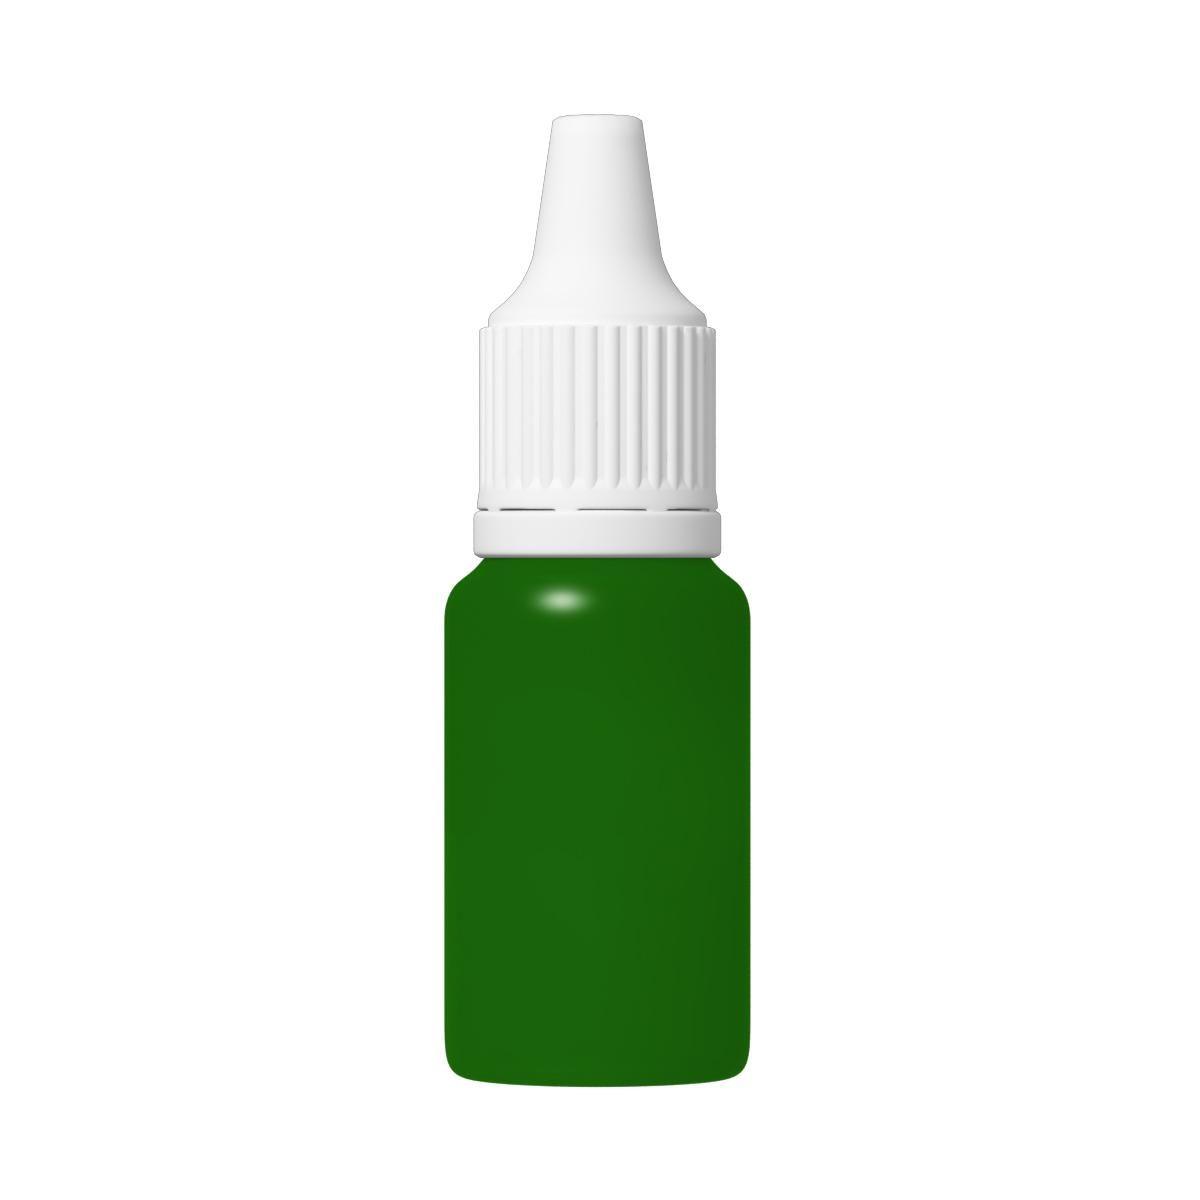 TFC Silikonfarbe Farbpaste Silikon Kautschuk RAL6010 grasgrün grass green